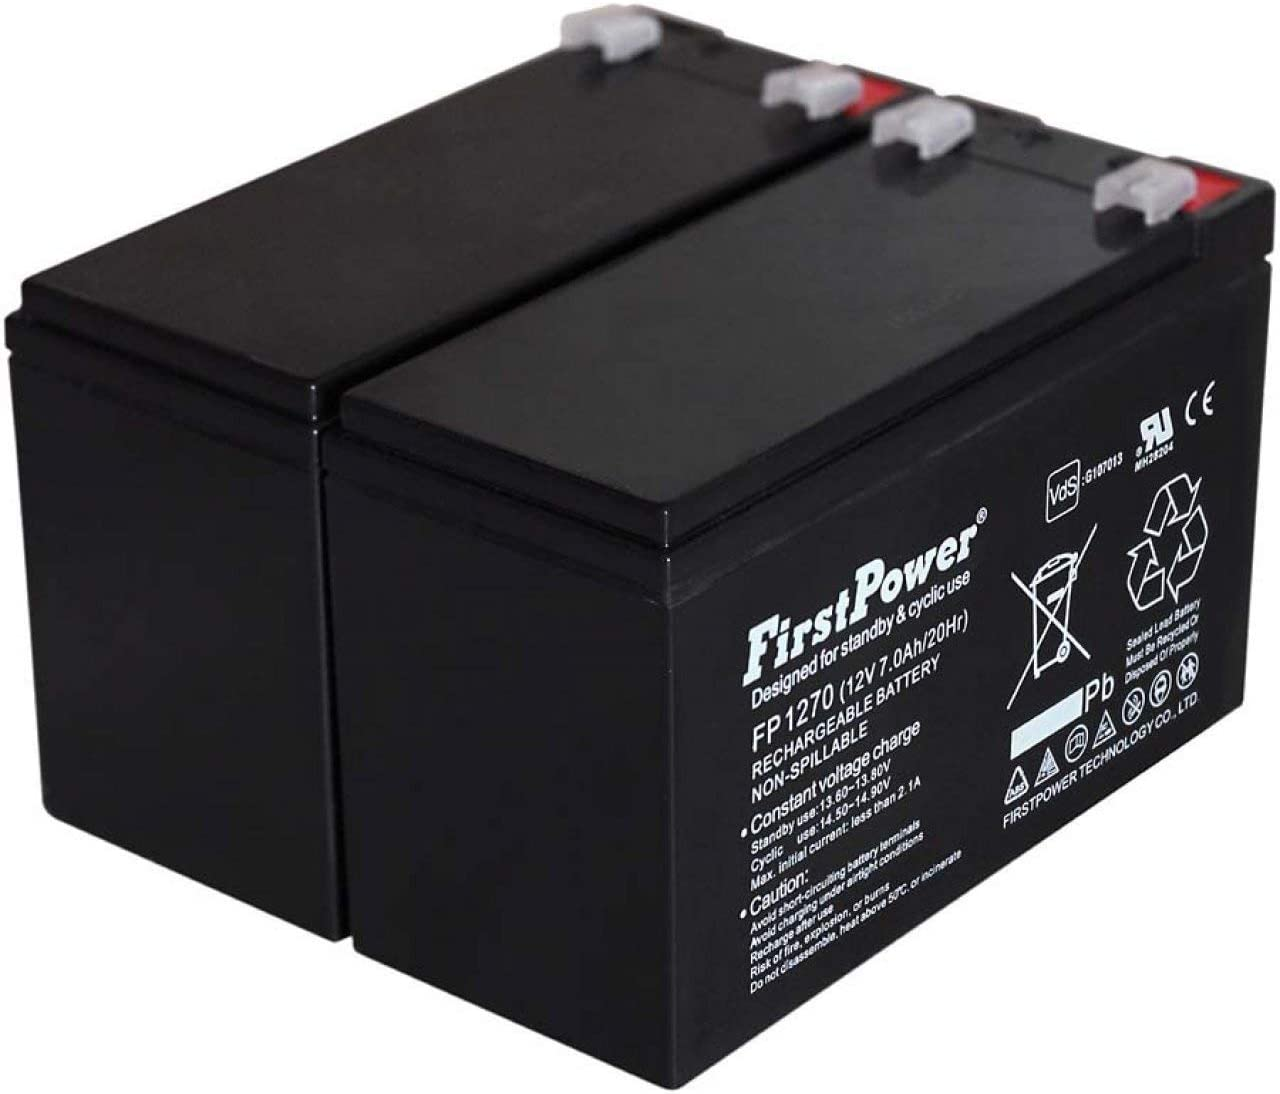 FirstPower Batería de Gel para SAI APC Smart-UPS SMT750I 7Ah 12V